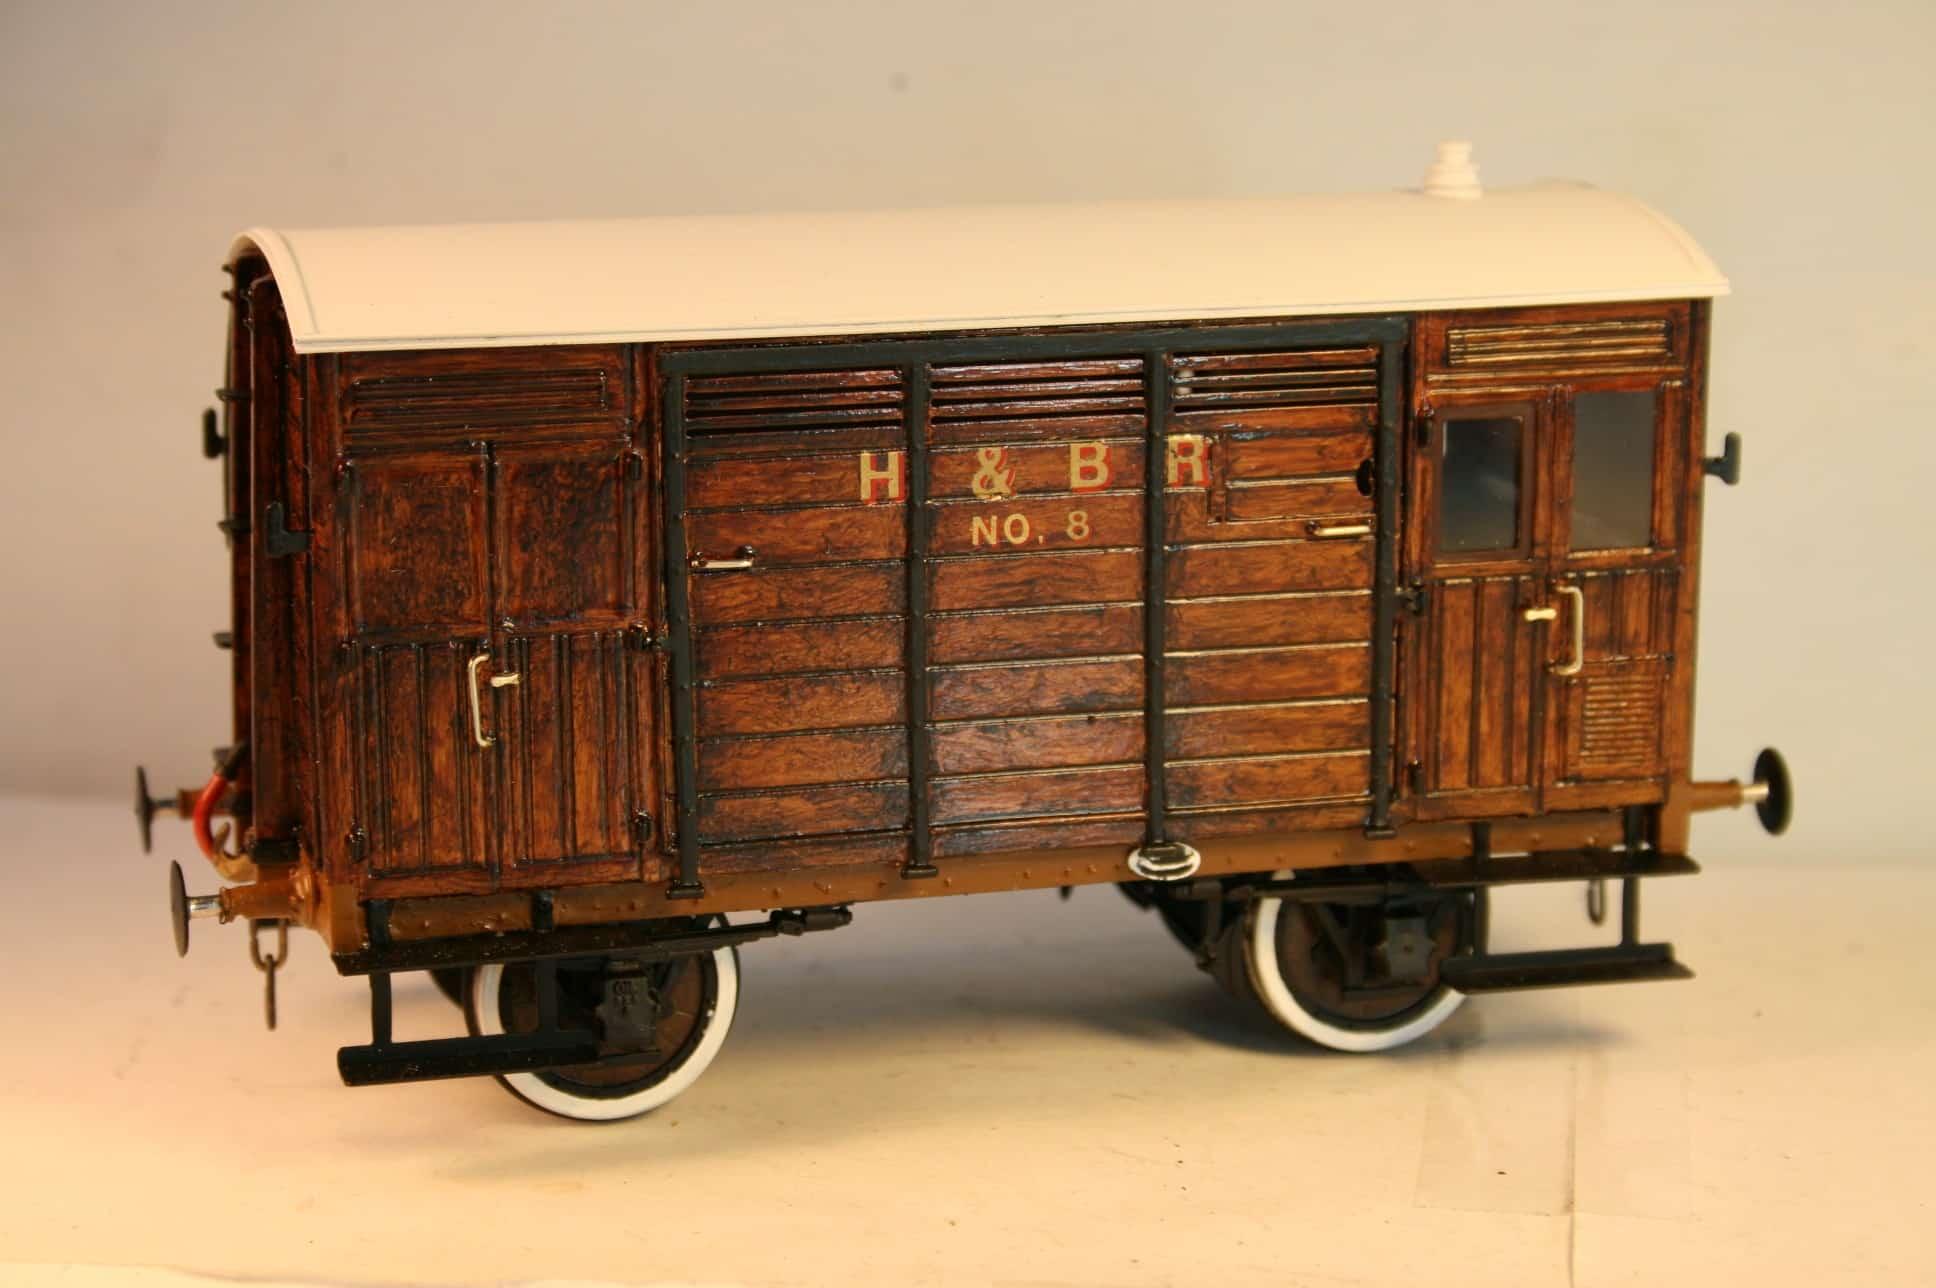 Hull & Barnsley Horsebox number 8